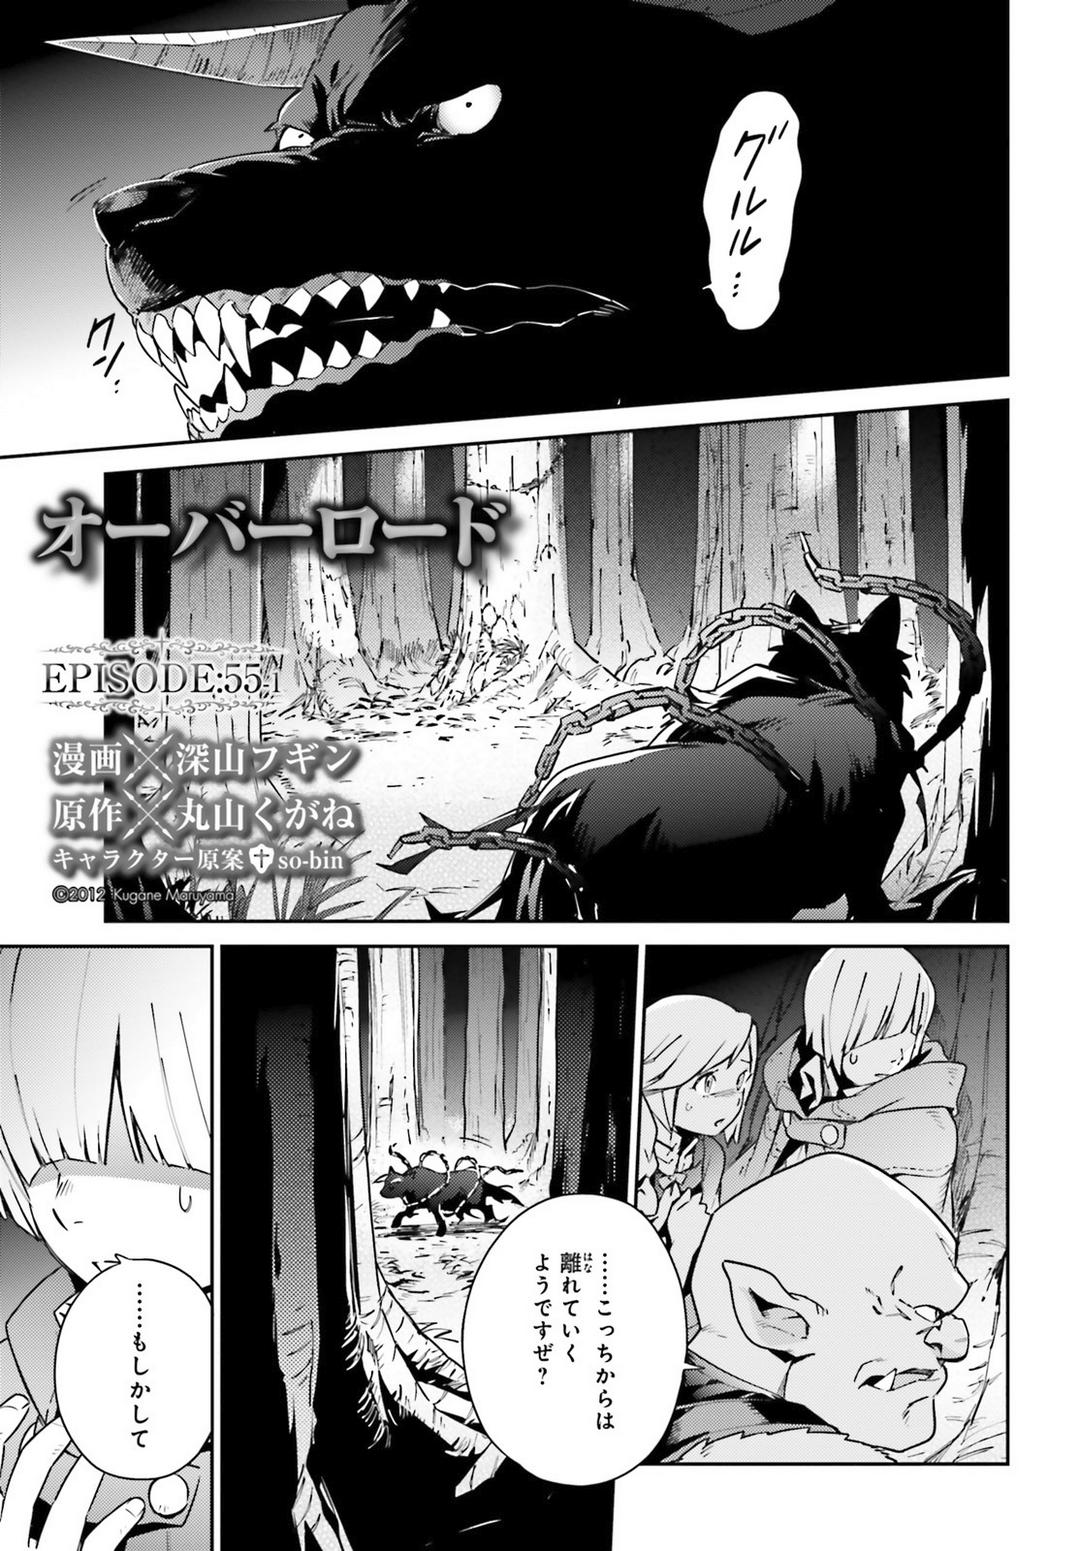 Overlord Manga Chapter 55.1